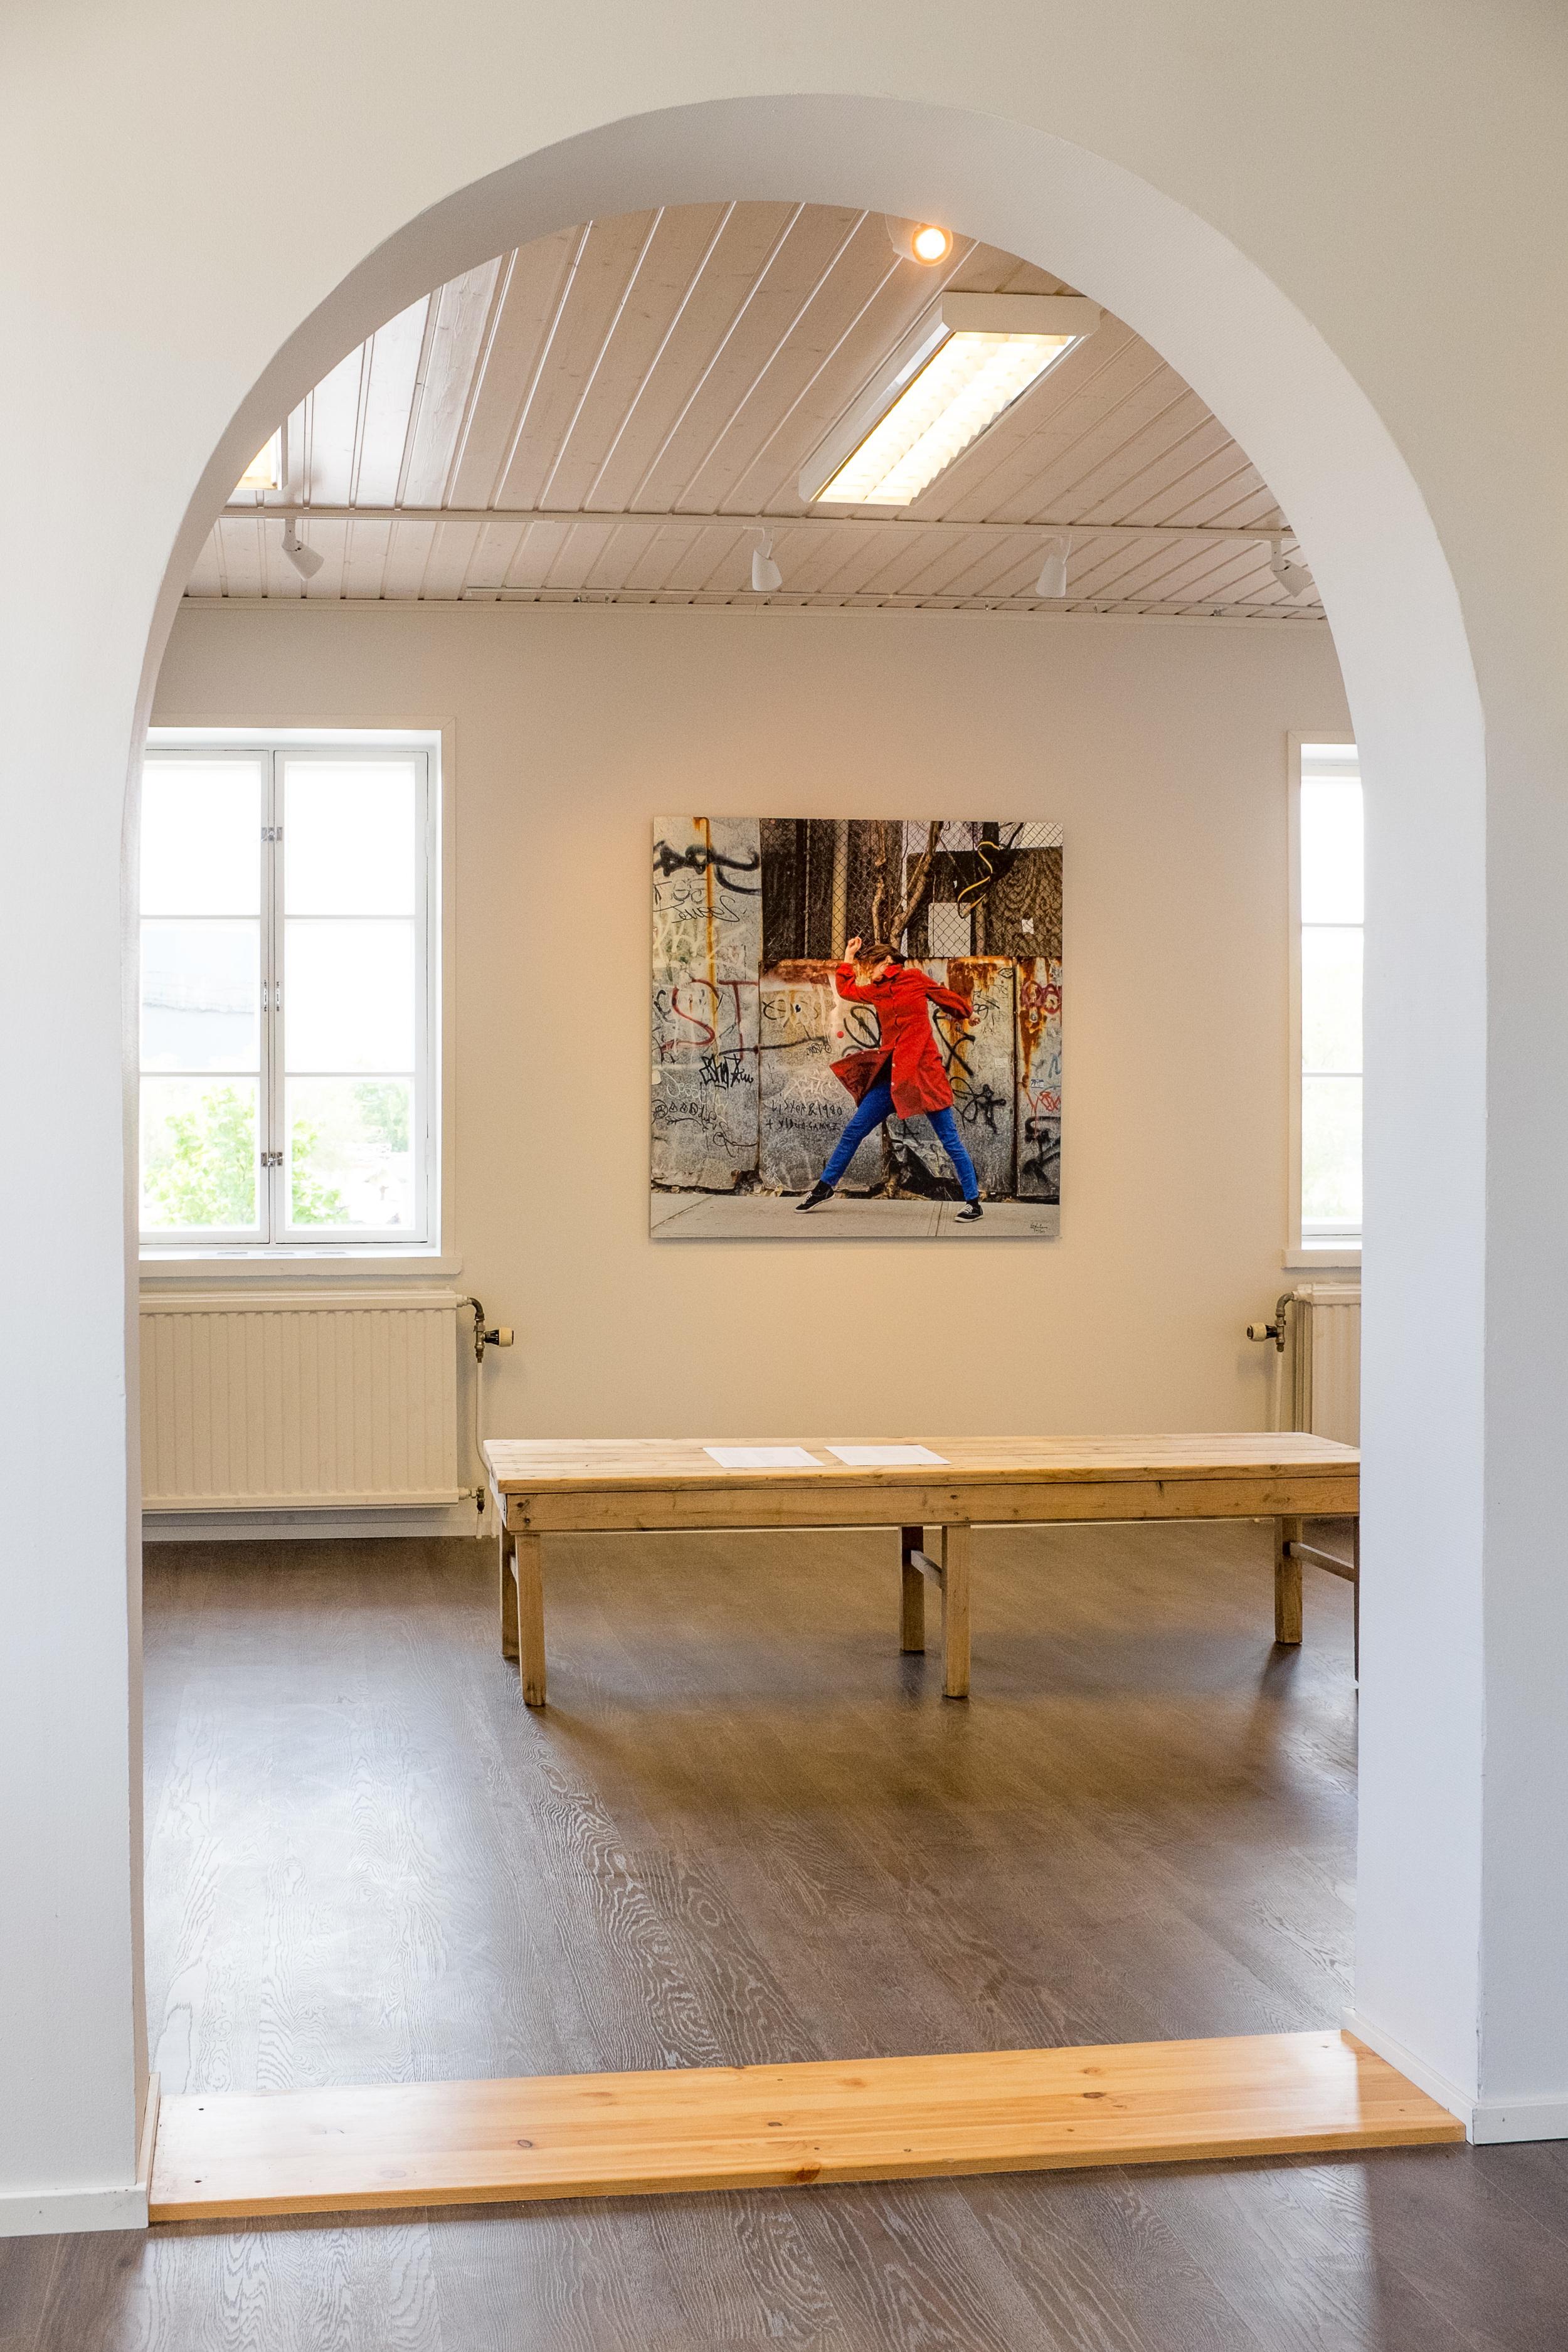 RAPID DEVELOPMENT #001 - 1ST EDITION - 120 X 120 CM - gallery view upstairs